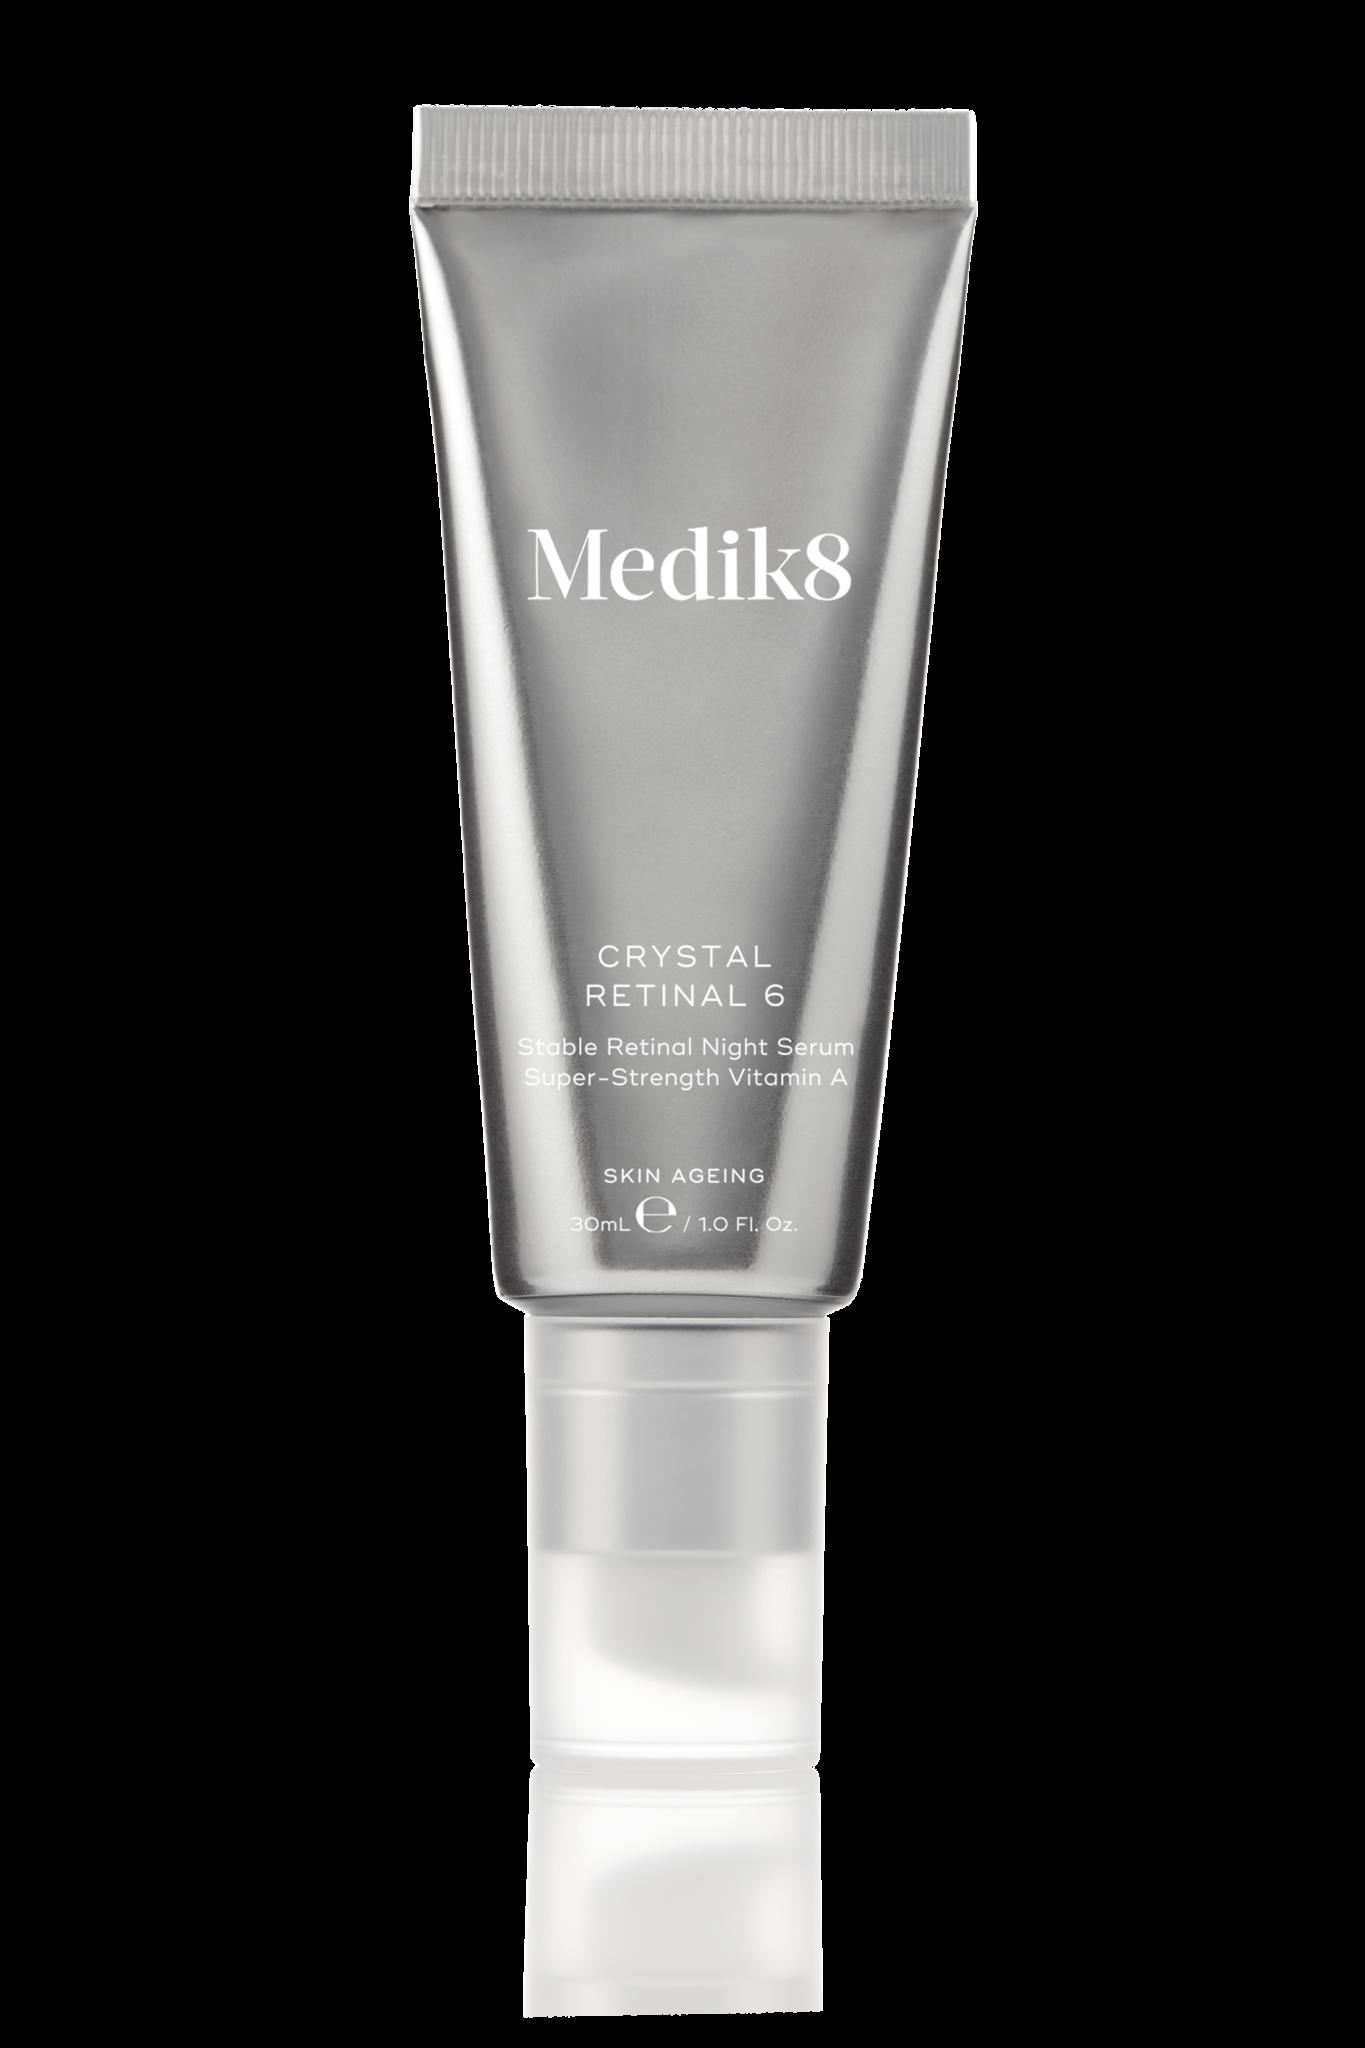 Medik8 Stable Retinal Night Serum Super-Strength Vitamin A